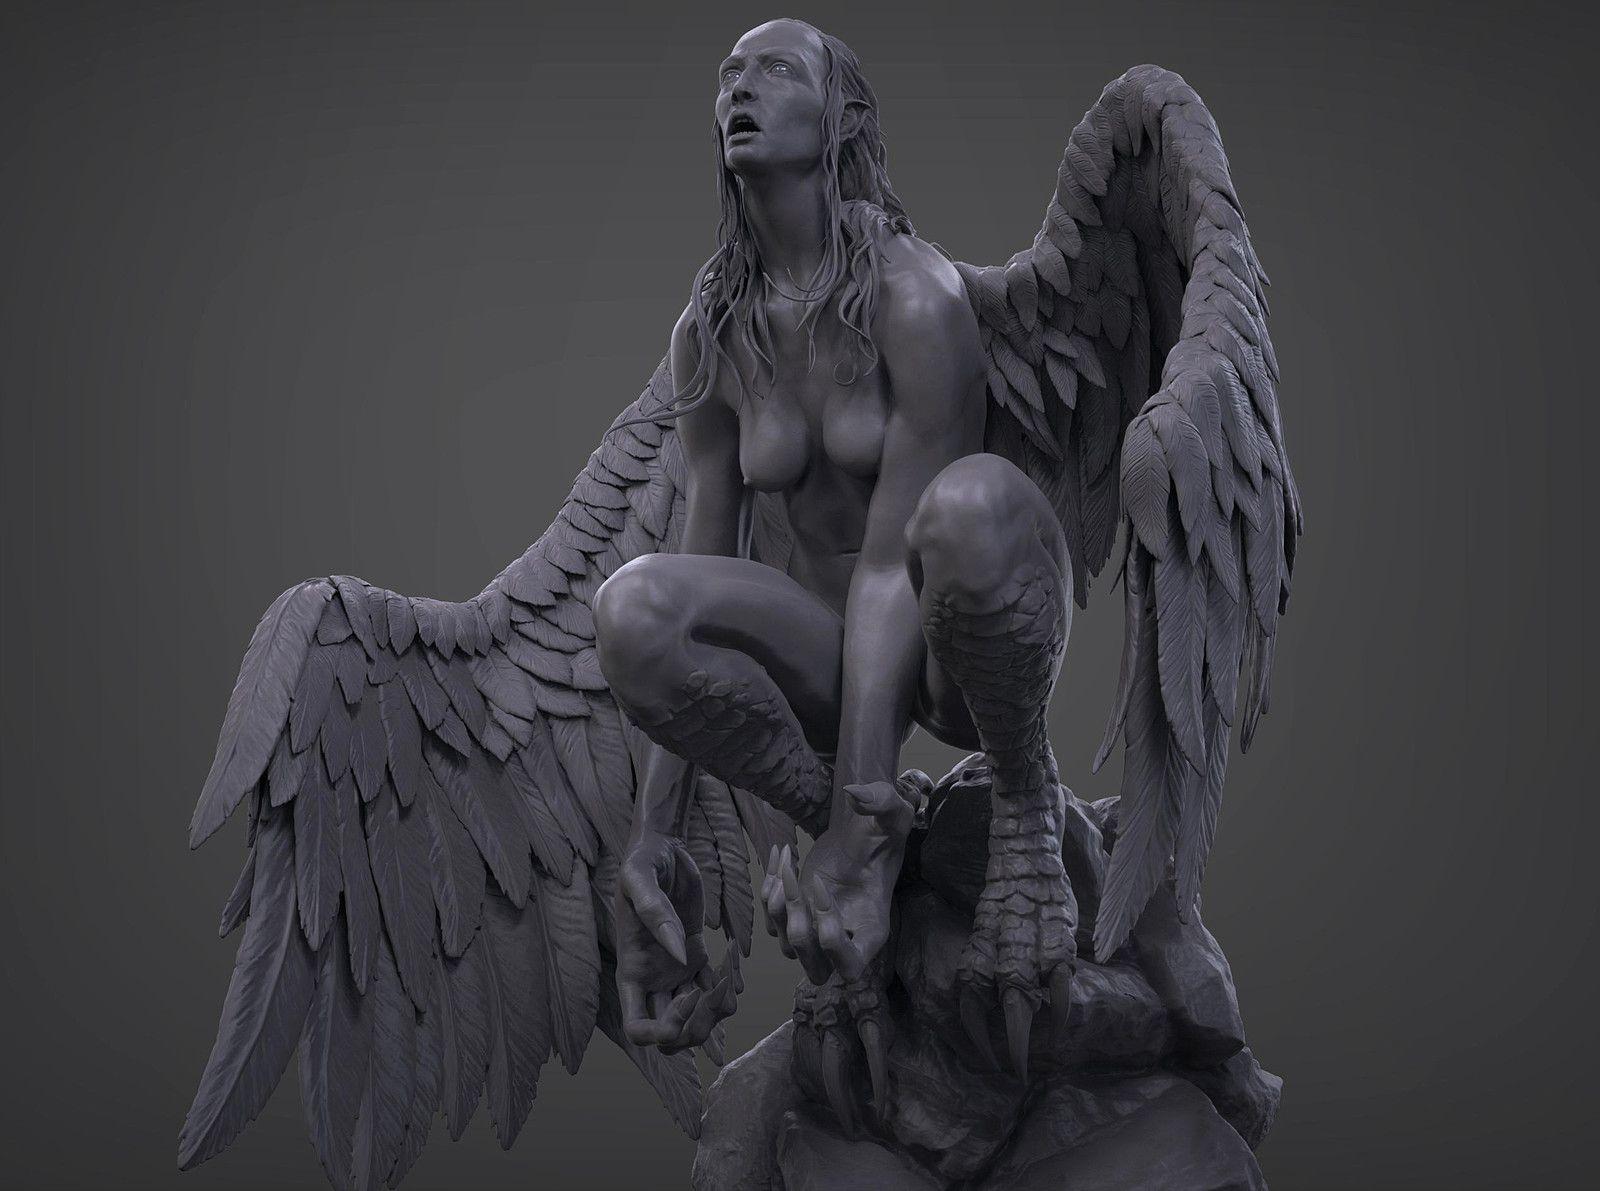 Harpy, Yinan Kuang on ArtStation at https://www.artstation.com/artwork/rzmxa